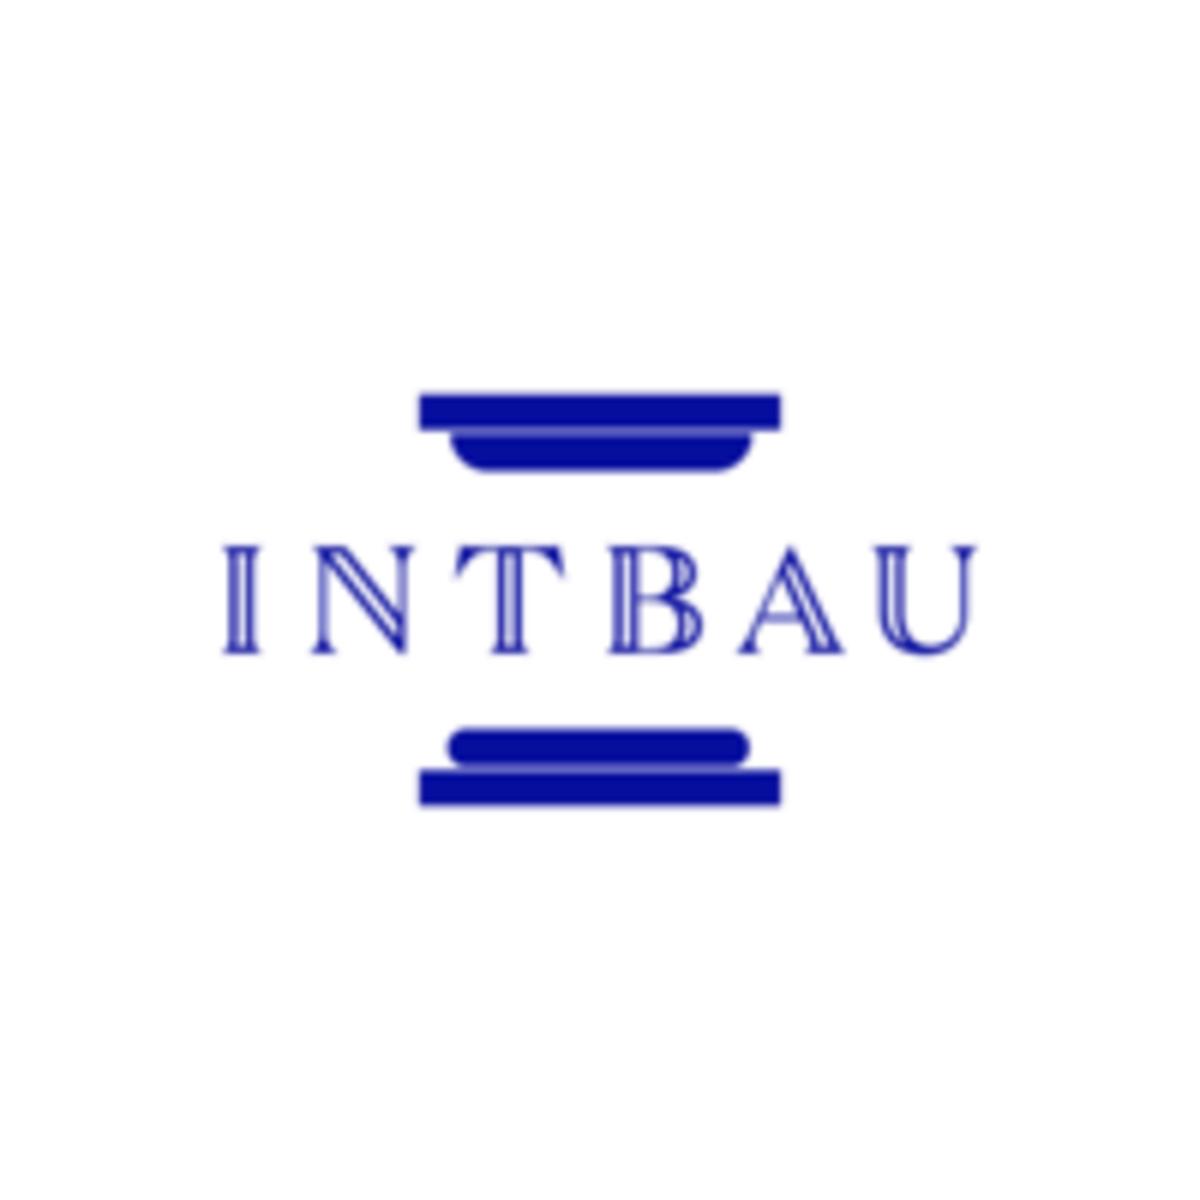 Intbau logo